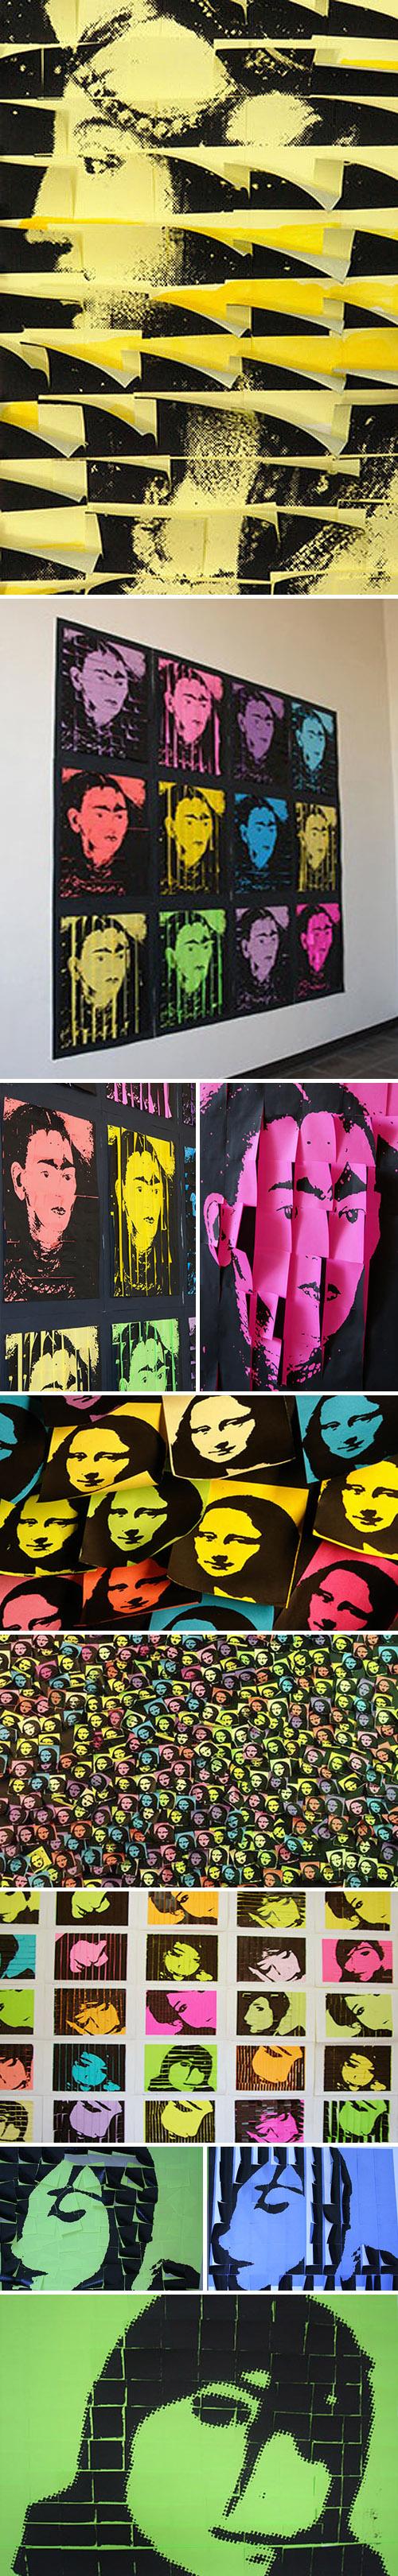 Post-it art, silk screen, pop art, Turkey, Mona Lisa, Frida Kahlo